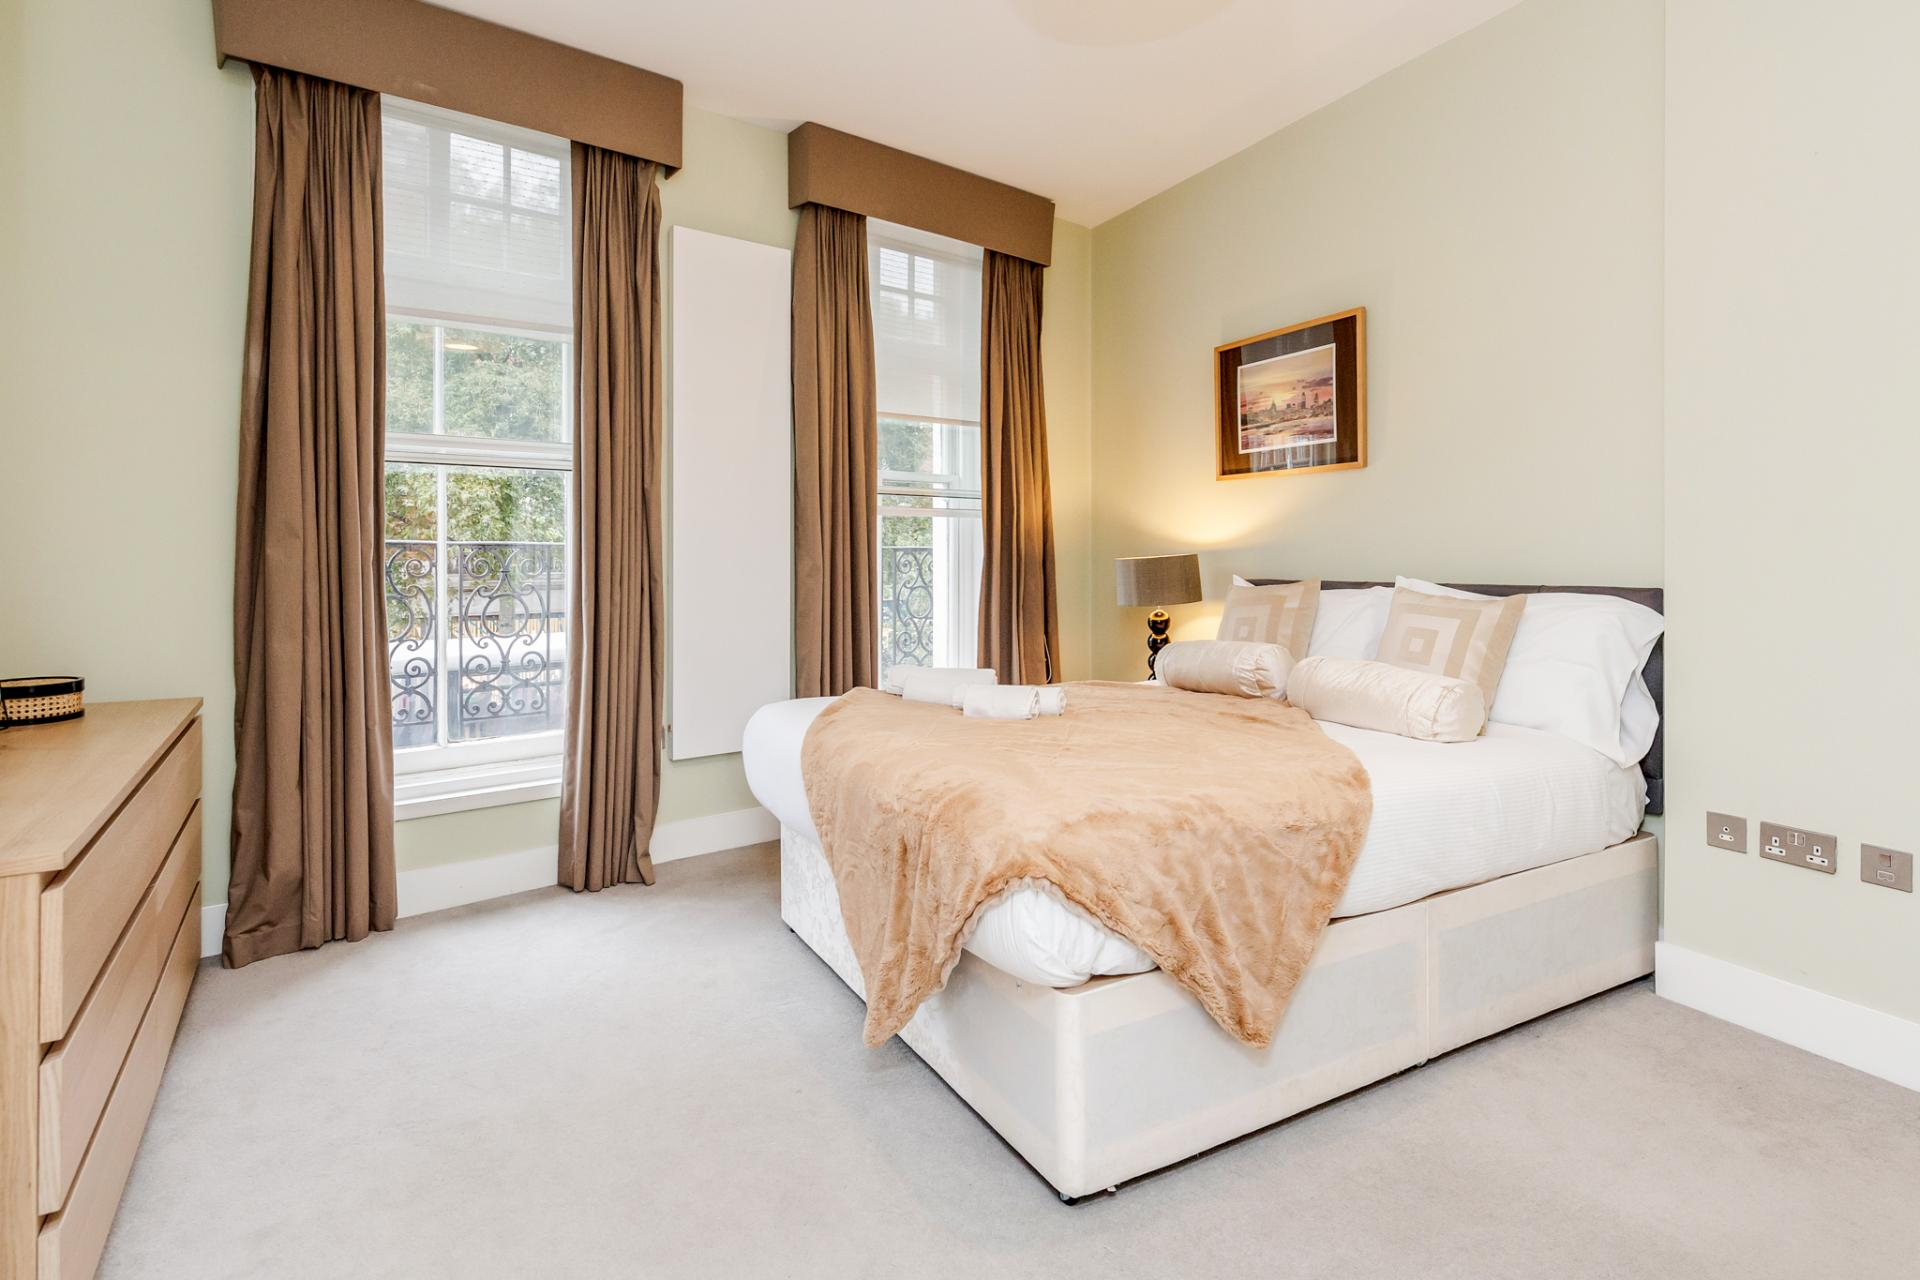 King bed at Eden Close Apartment, Kensington, London - Citybase Apartments